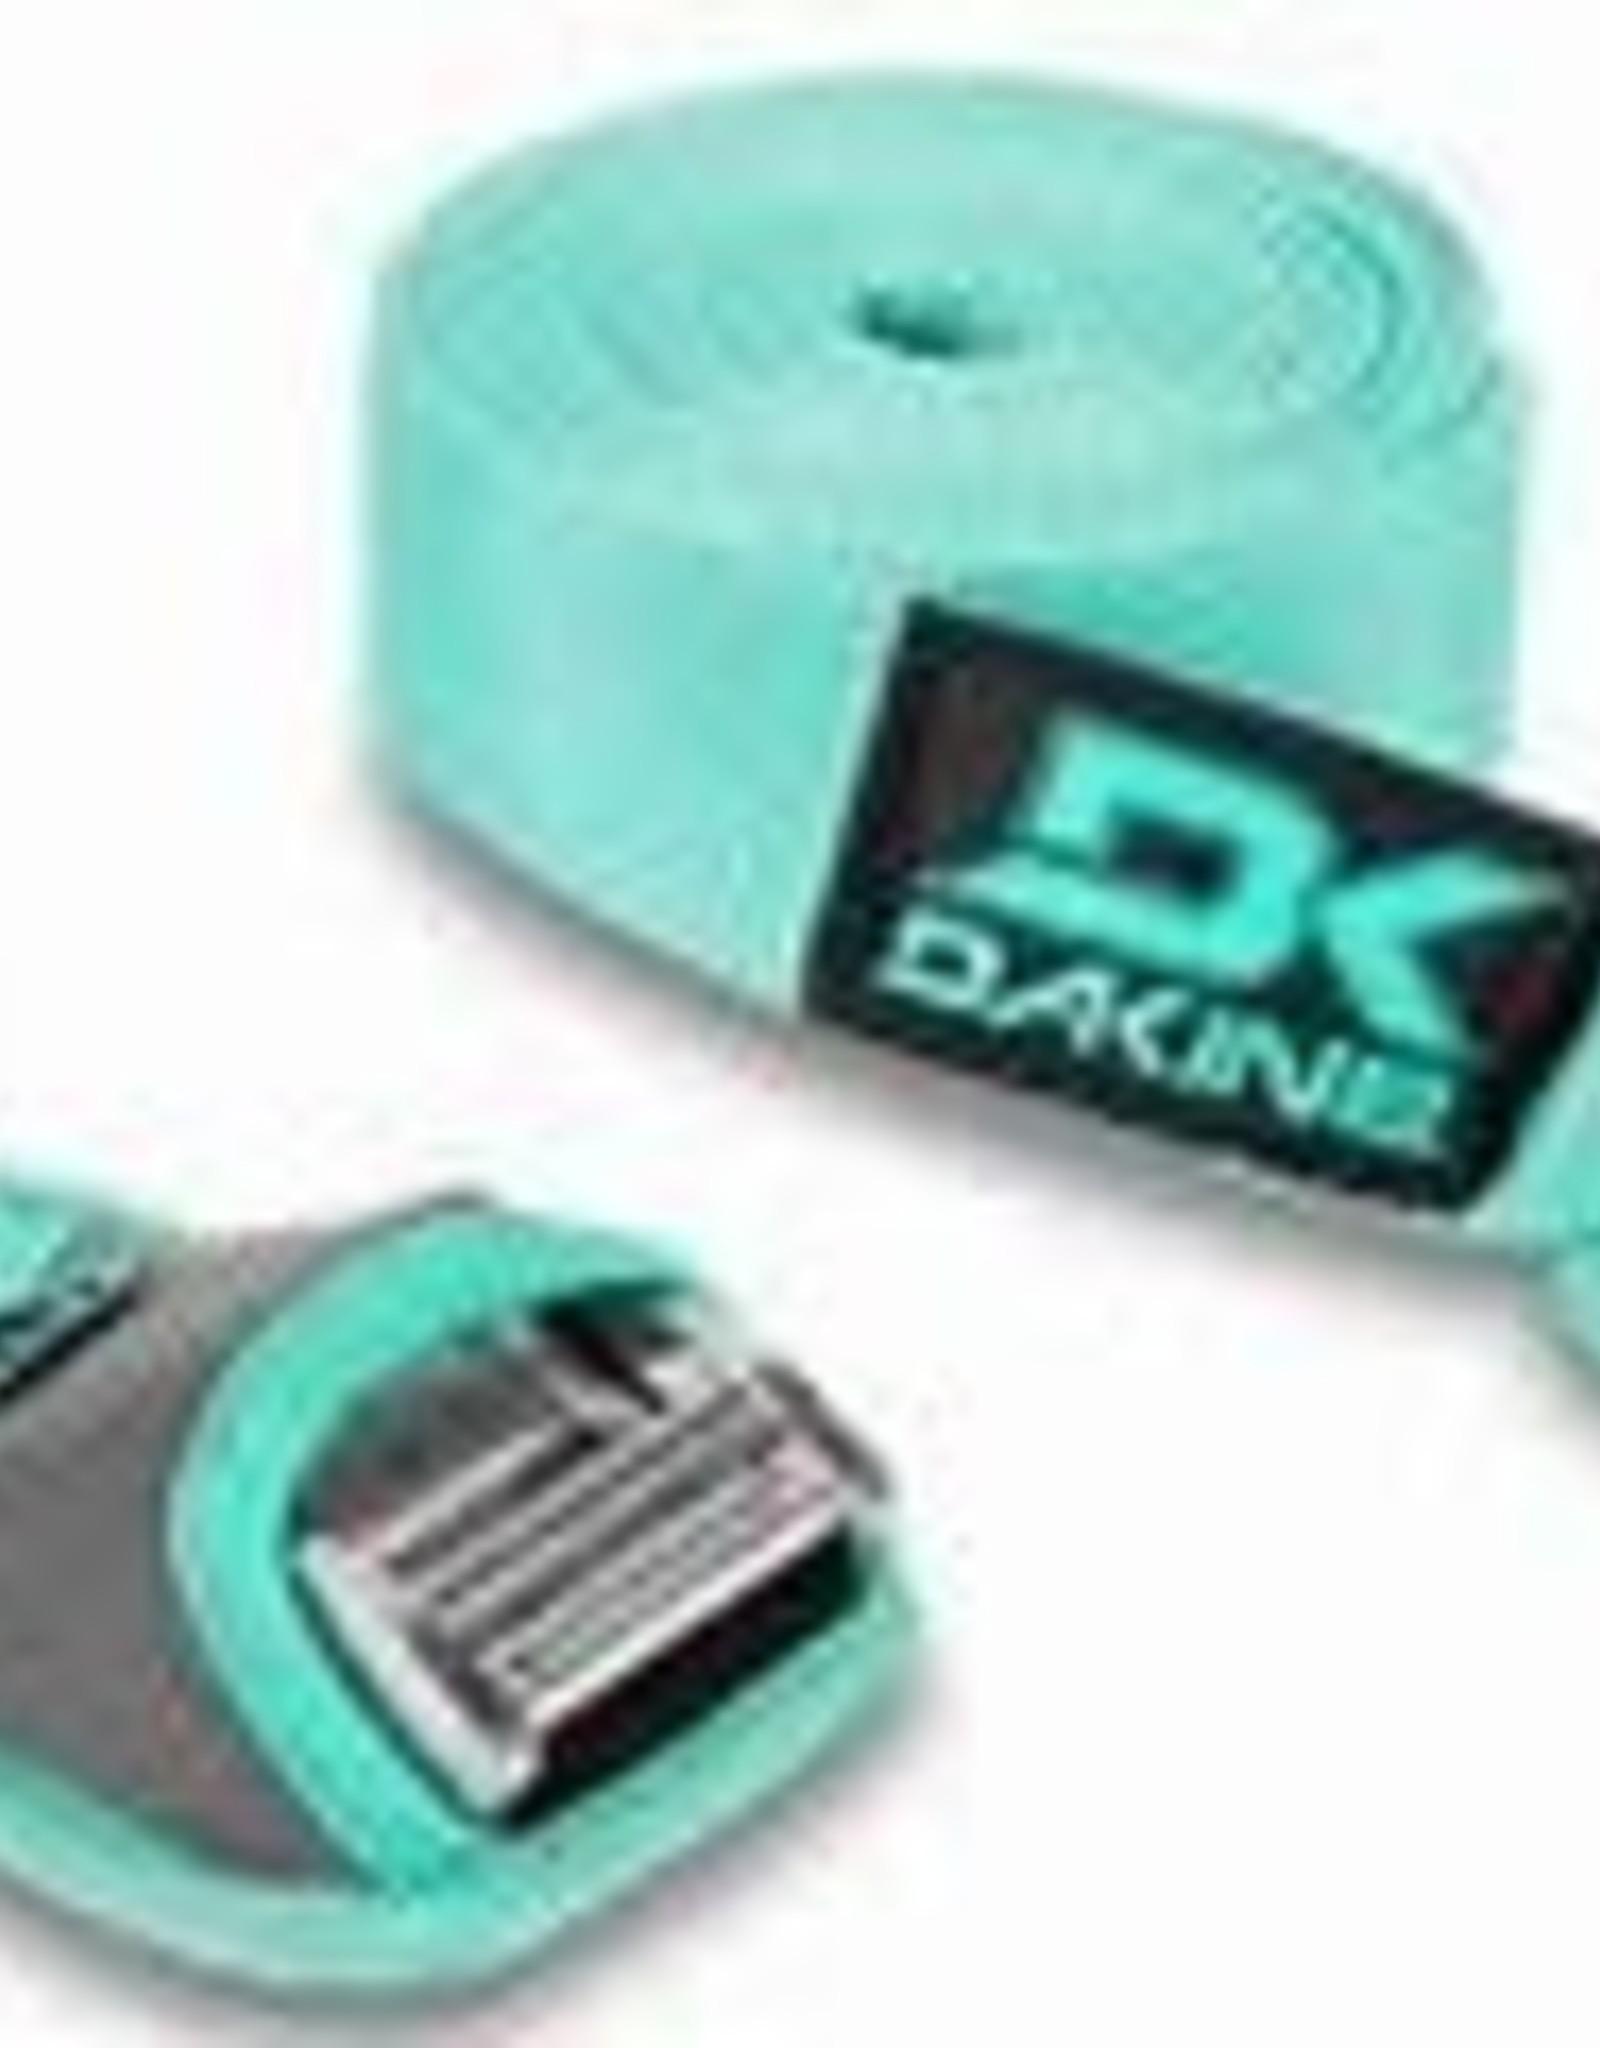 Dakine Dakine - BAJA TIE DOWN STRAPS 12' (2 pack) - Nile Blue